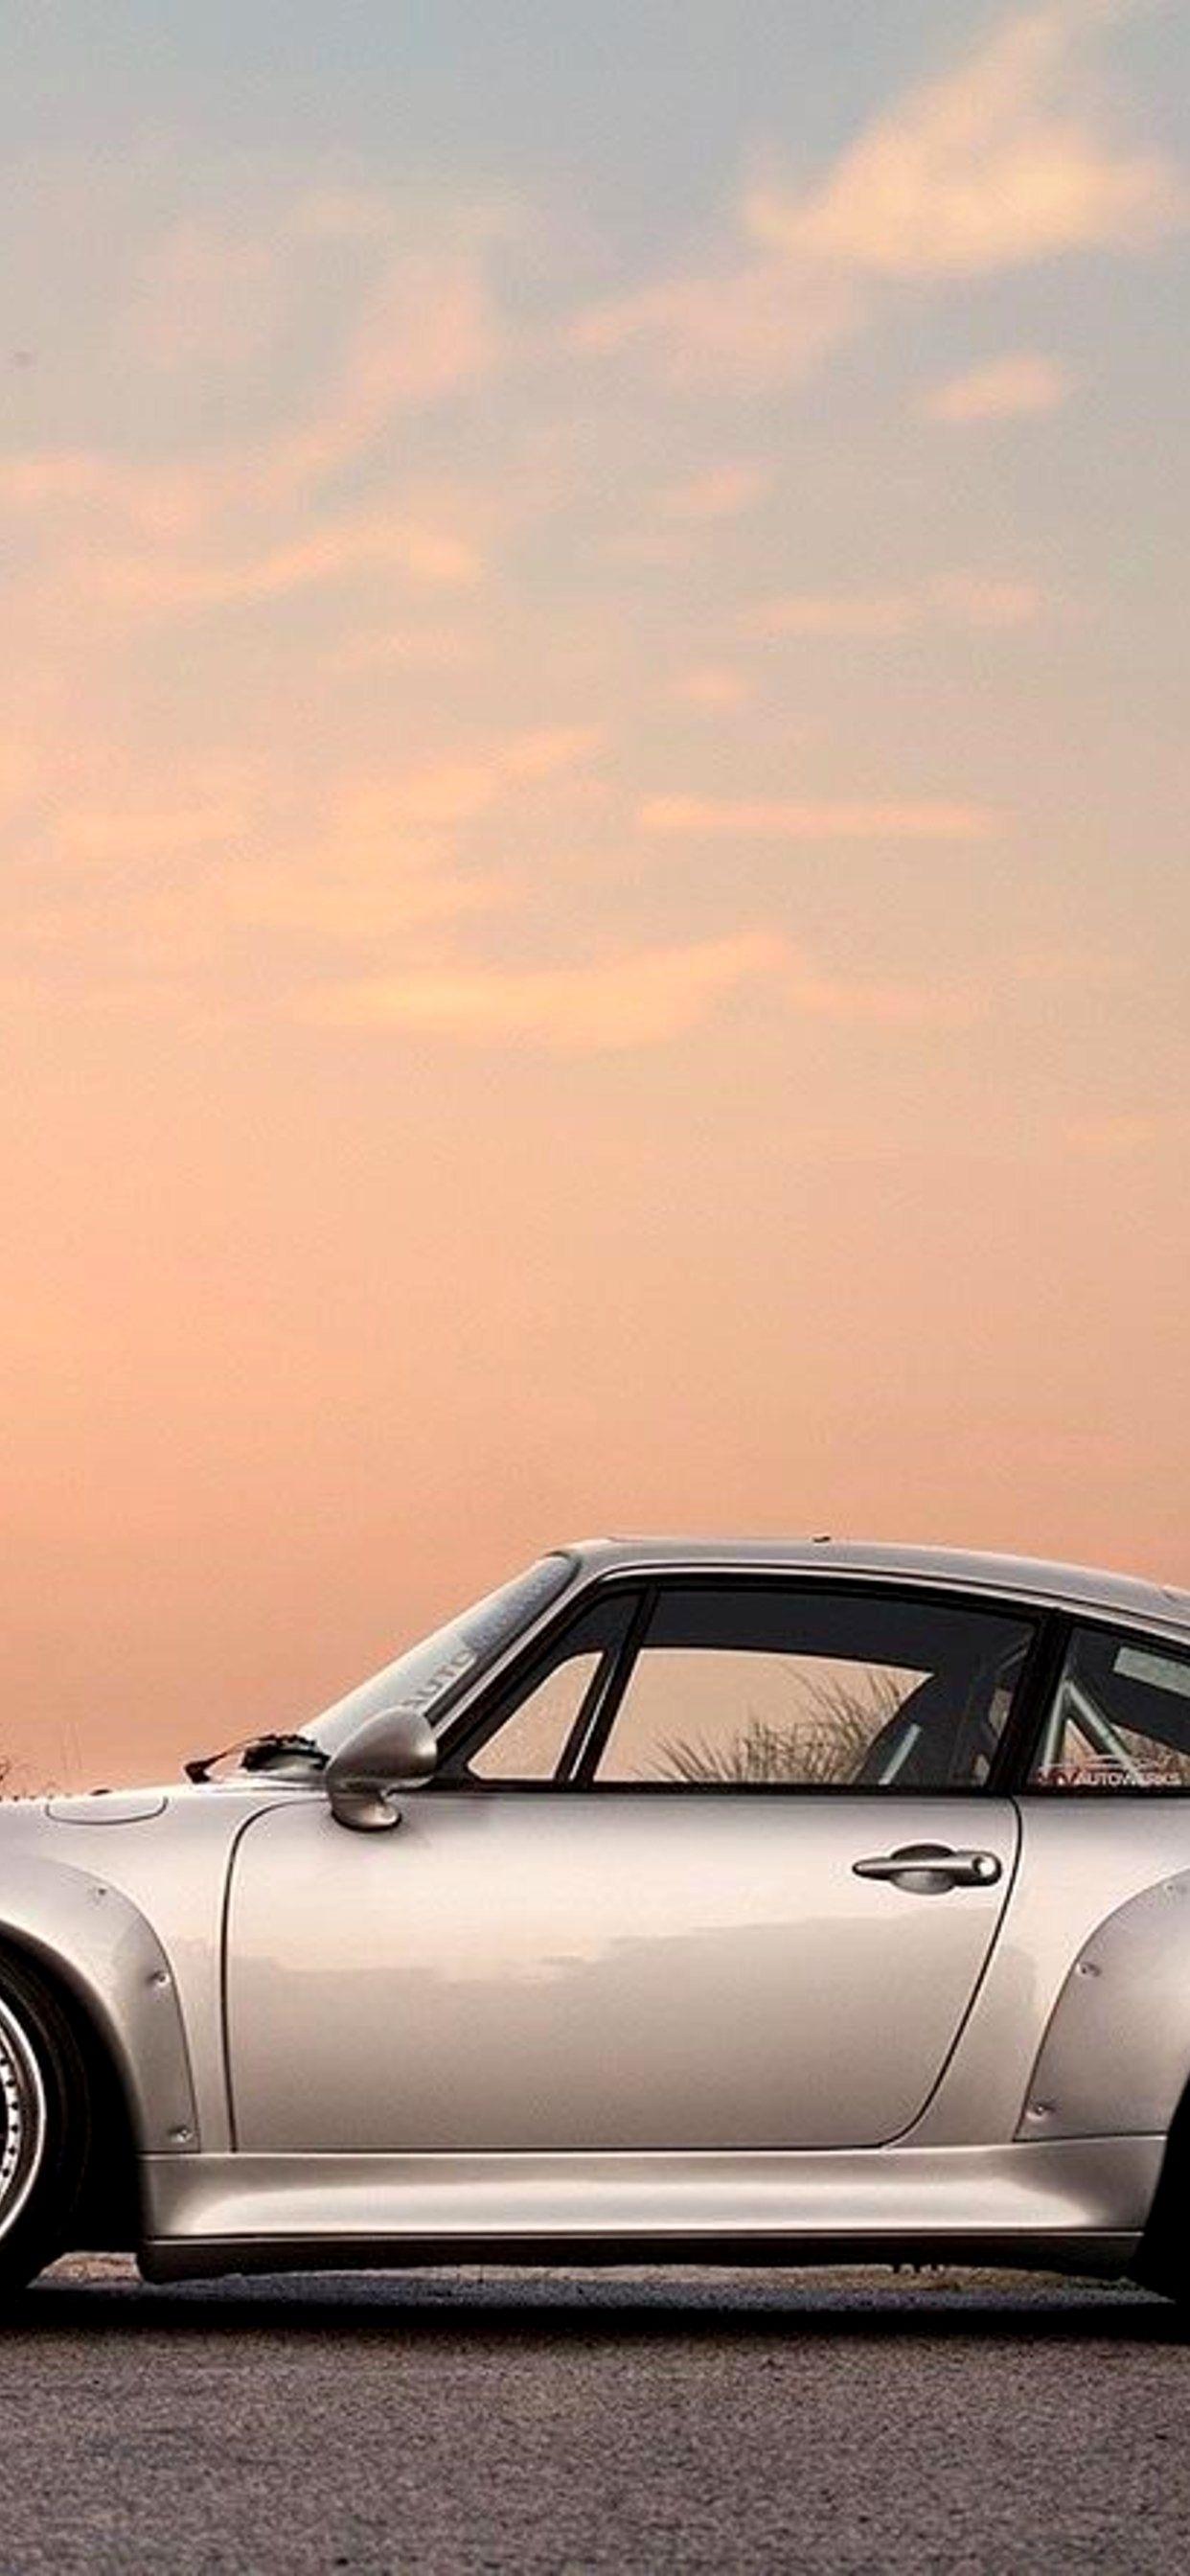 Porsche Wallpaper 4K Iphone Gallery di 2020 Mobil impian